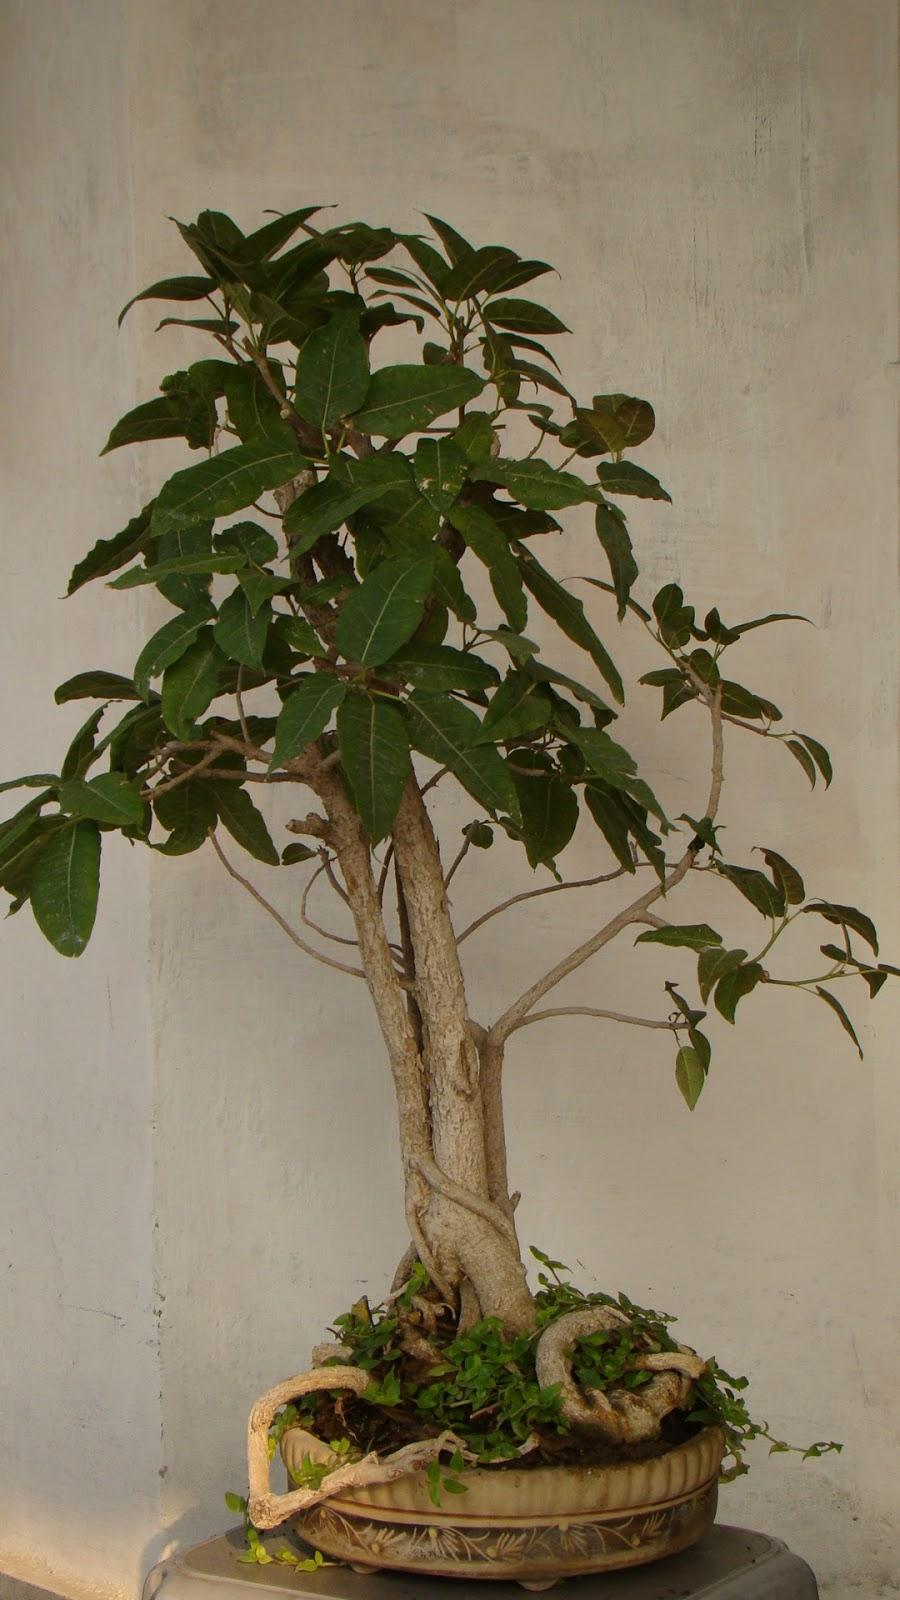 FAB HOBBY IDEAS 10 Bonsai The Zen Way Of Growing Trees